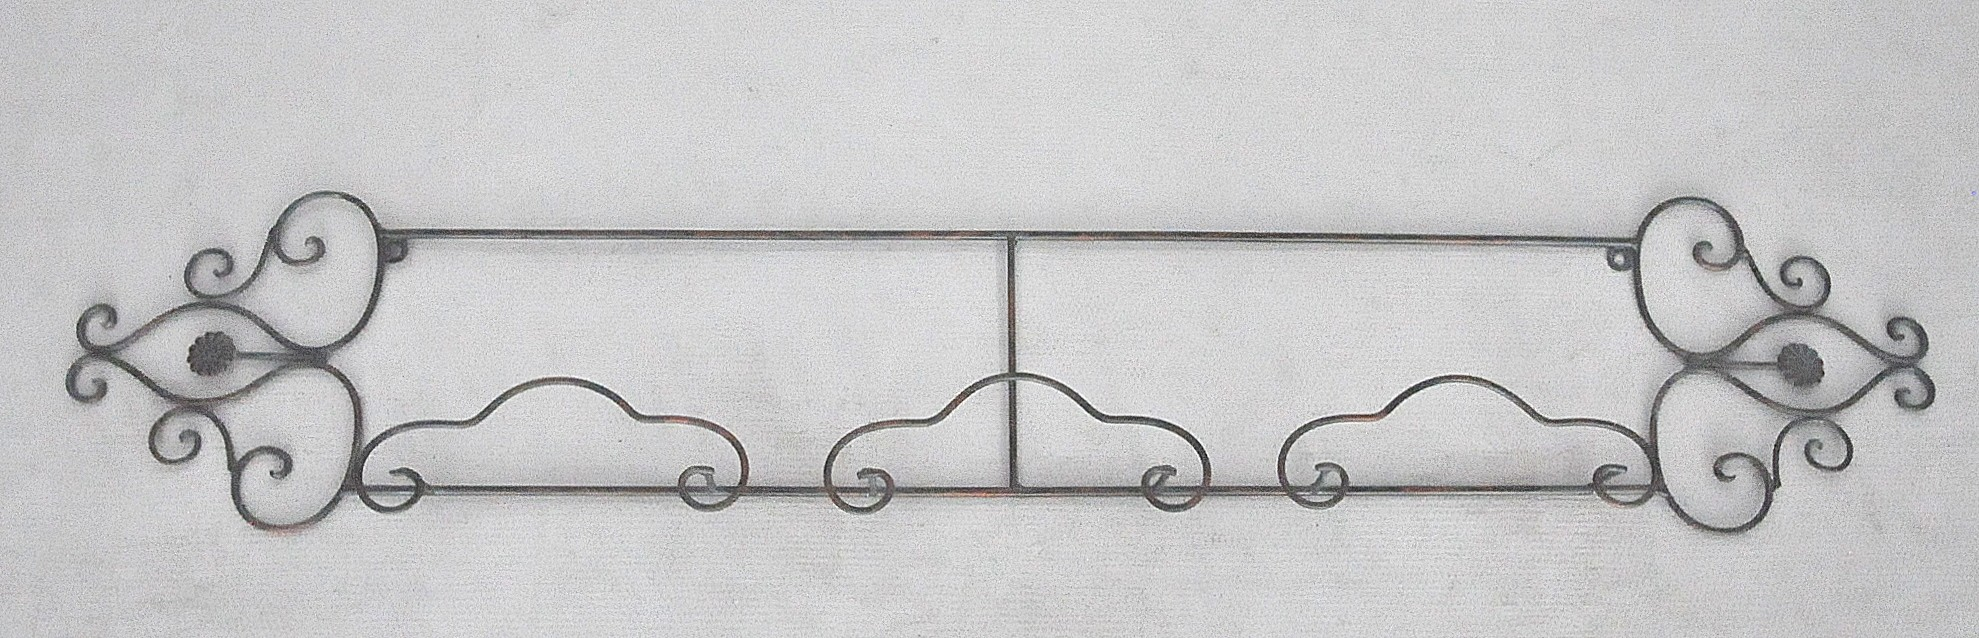 Porte assiettes en fer forg grand mod le demeure et jardin for Porte de jardin en fer forge